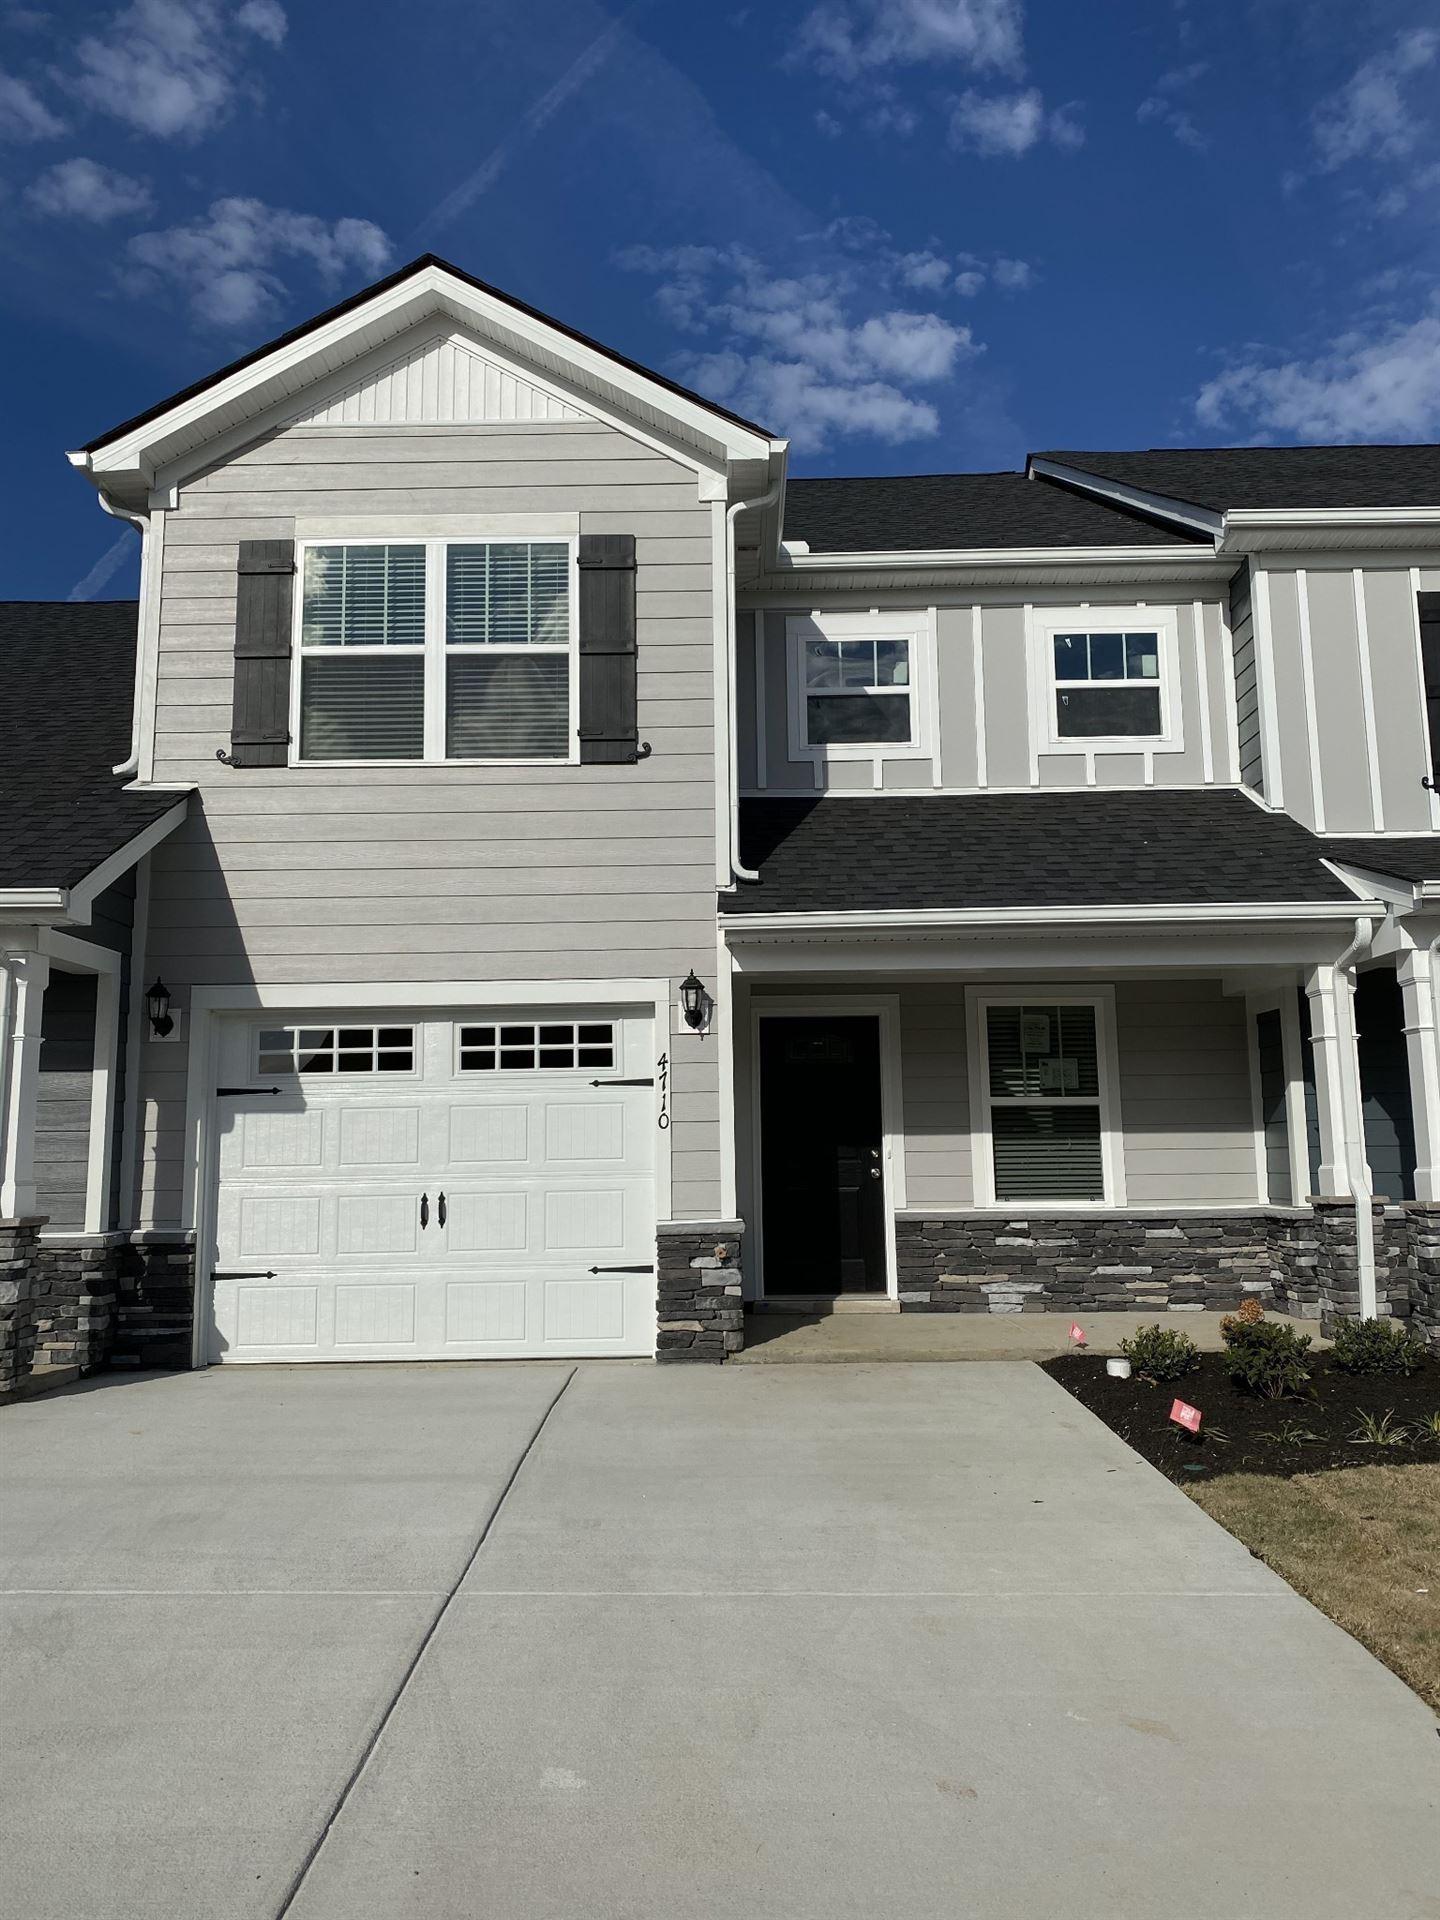 3210 Salerno Court lot 8 #08, Murfreesboro, TN 37129 - MLS#: 2262531